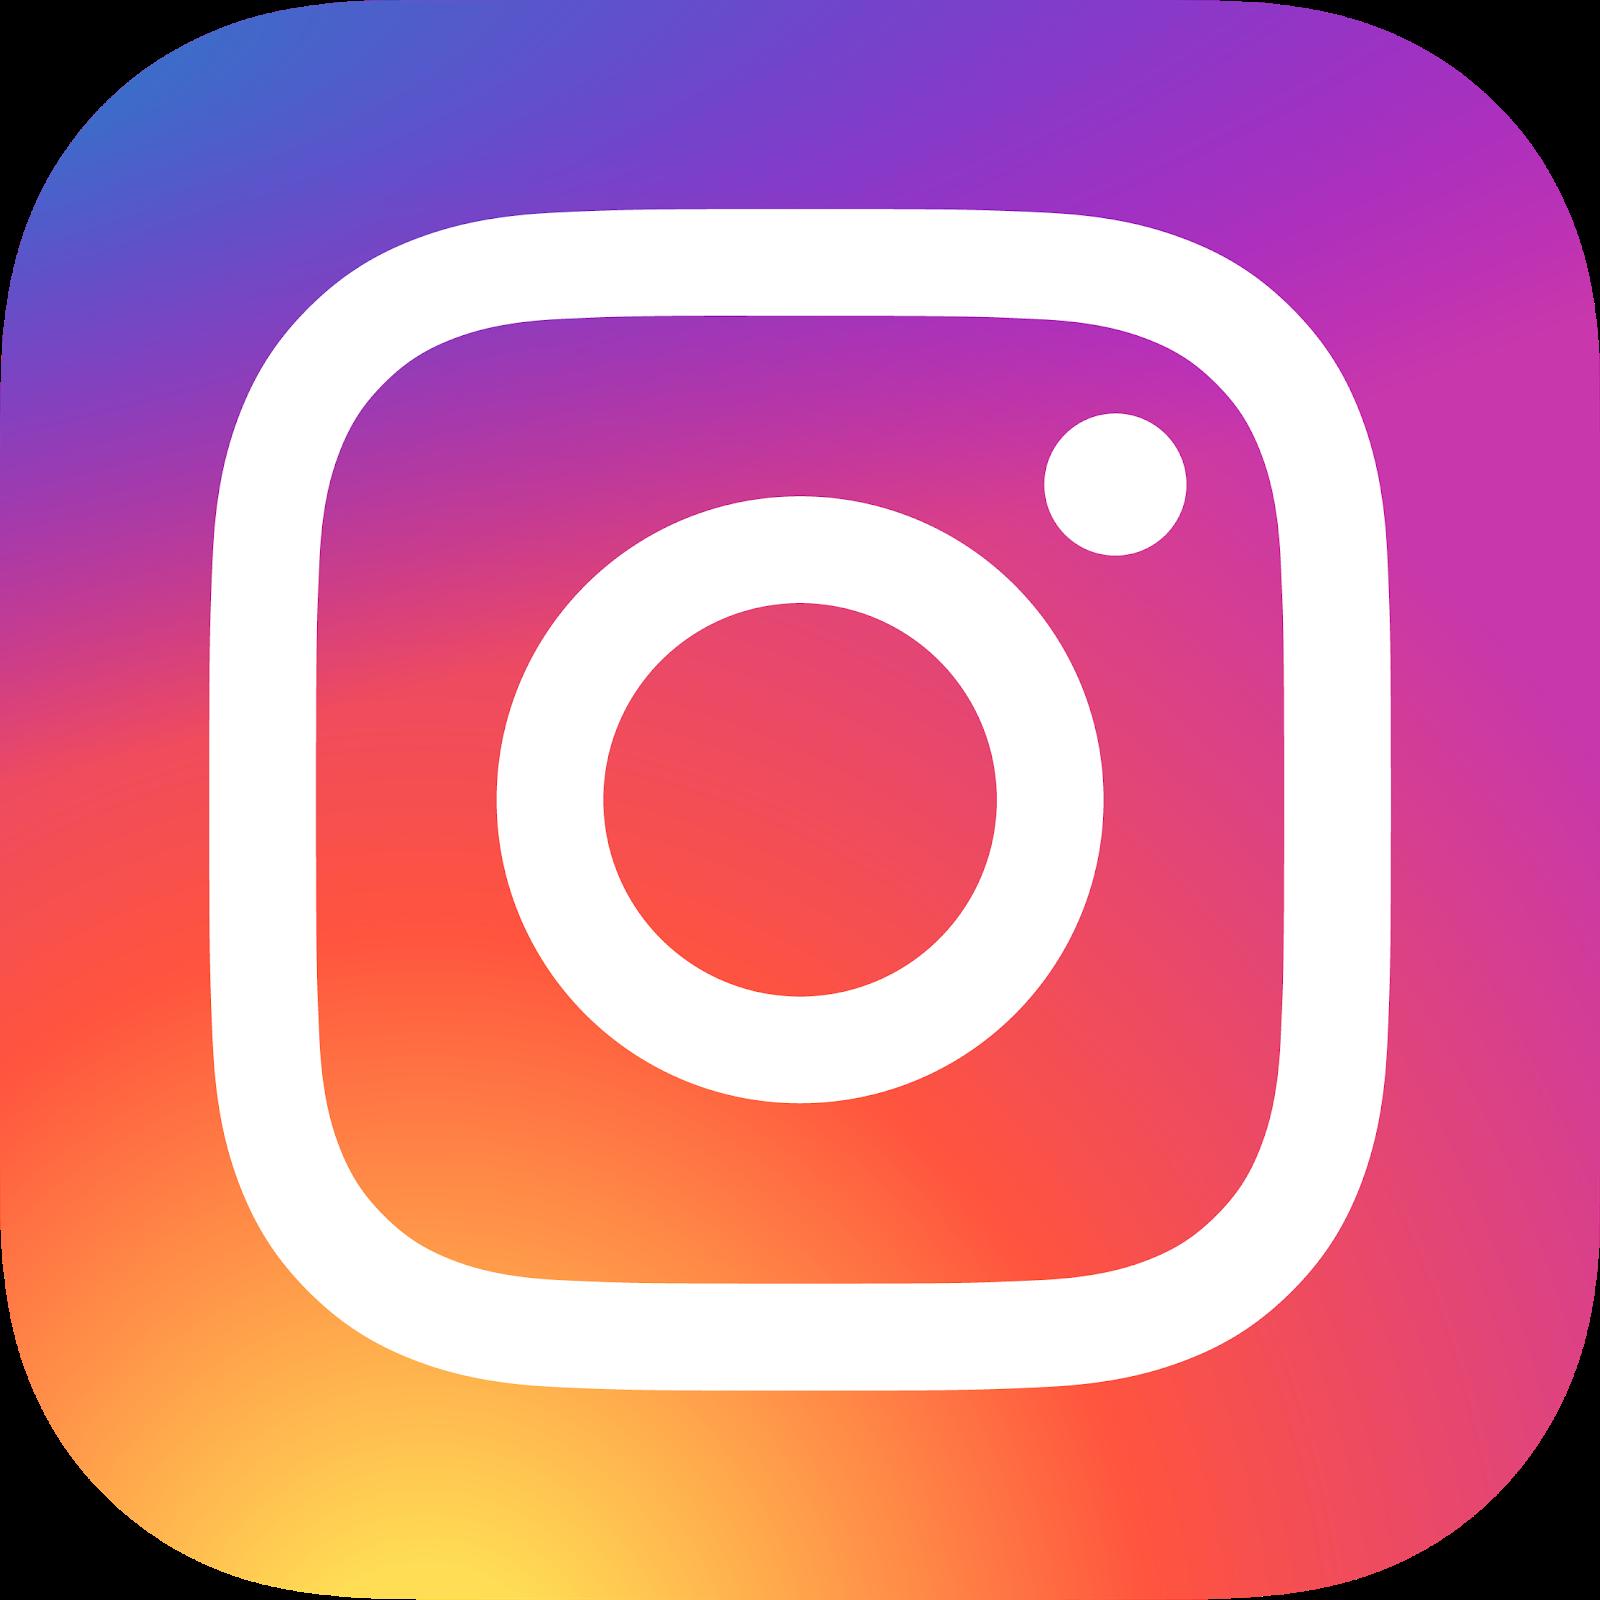 download logo Instagram vectors svg eps png psd ai.